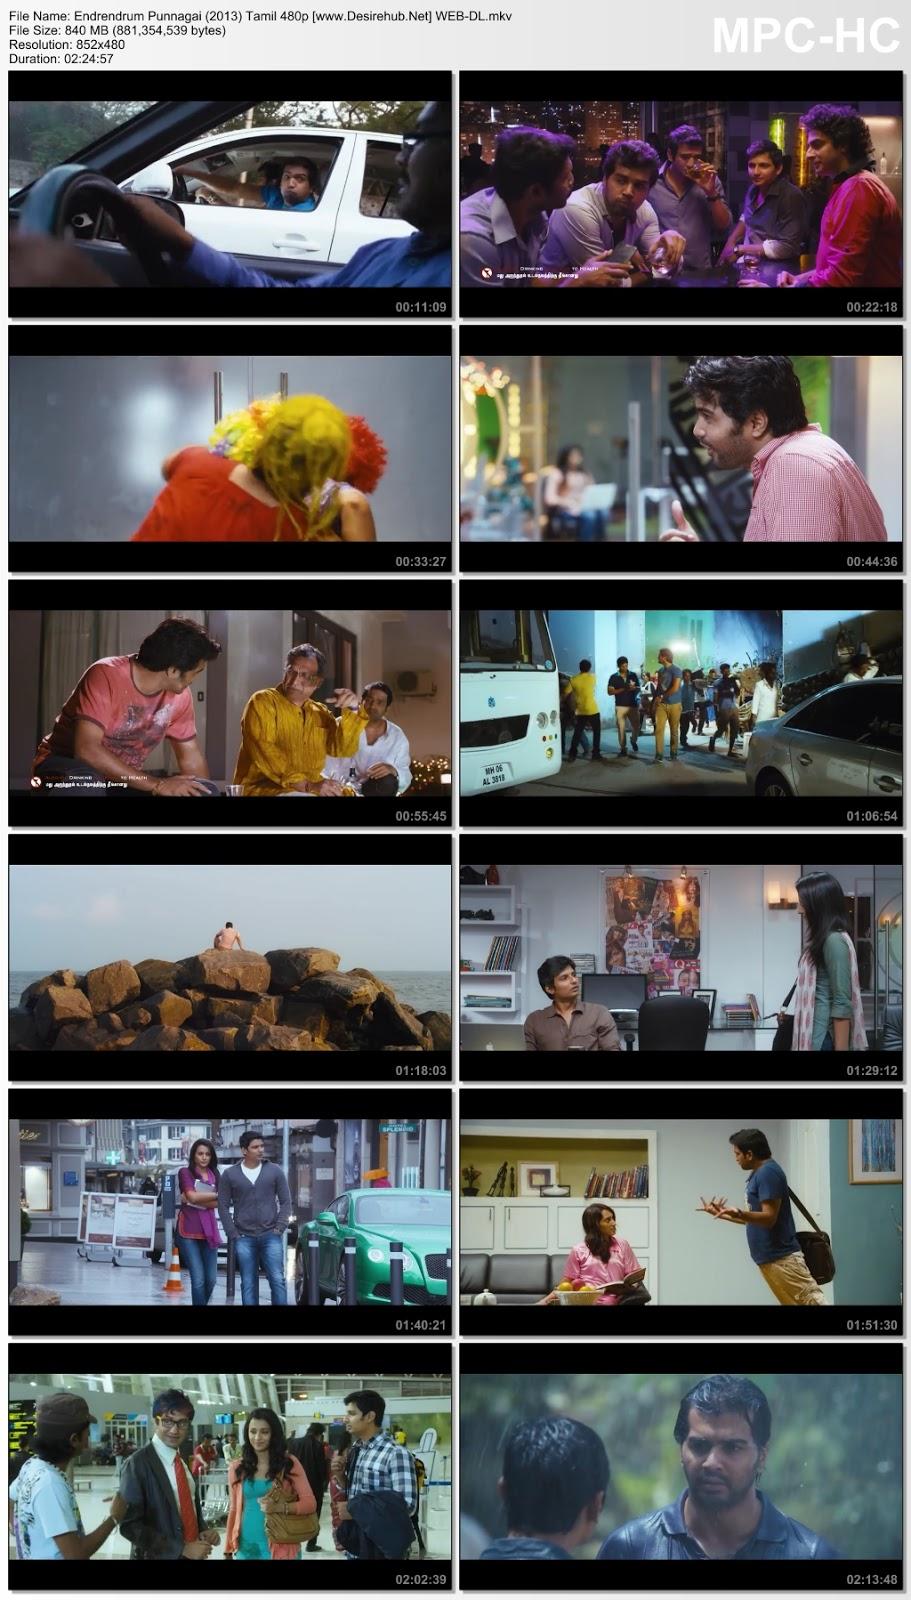 Endrendrum Punnagai (2013) Tamil 480p WEB-DL  800MB Desirehub